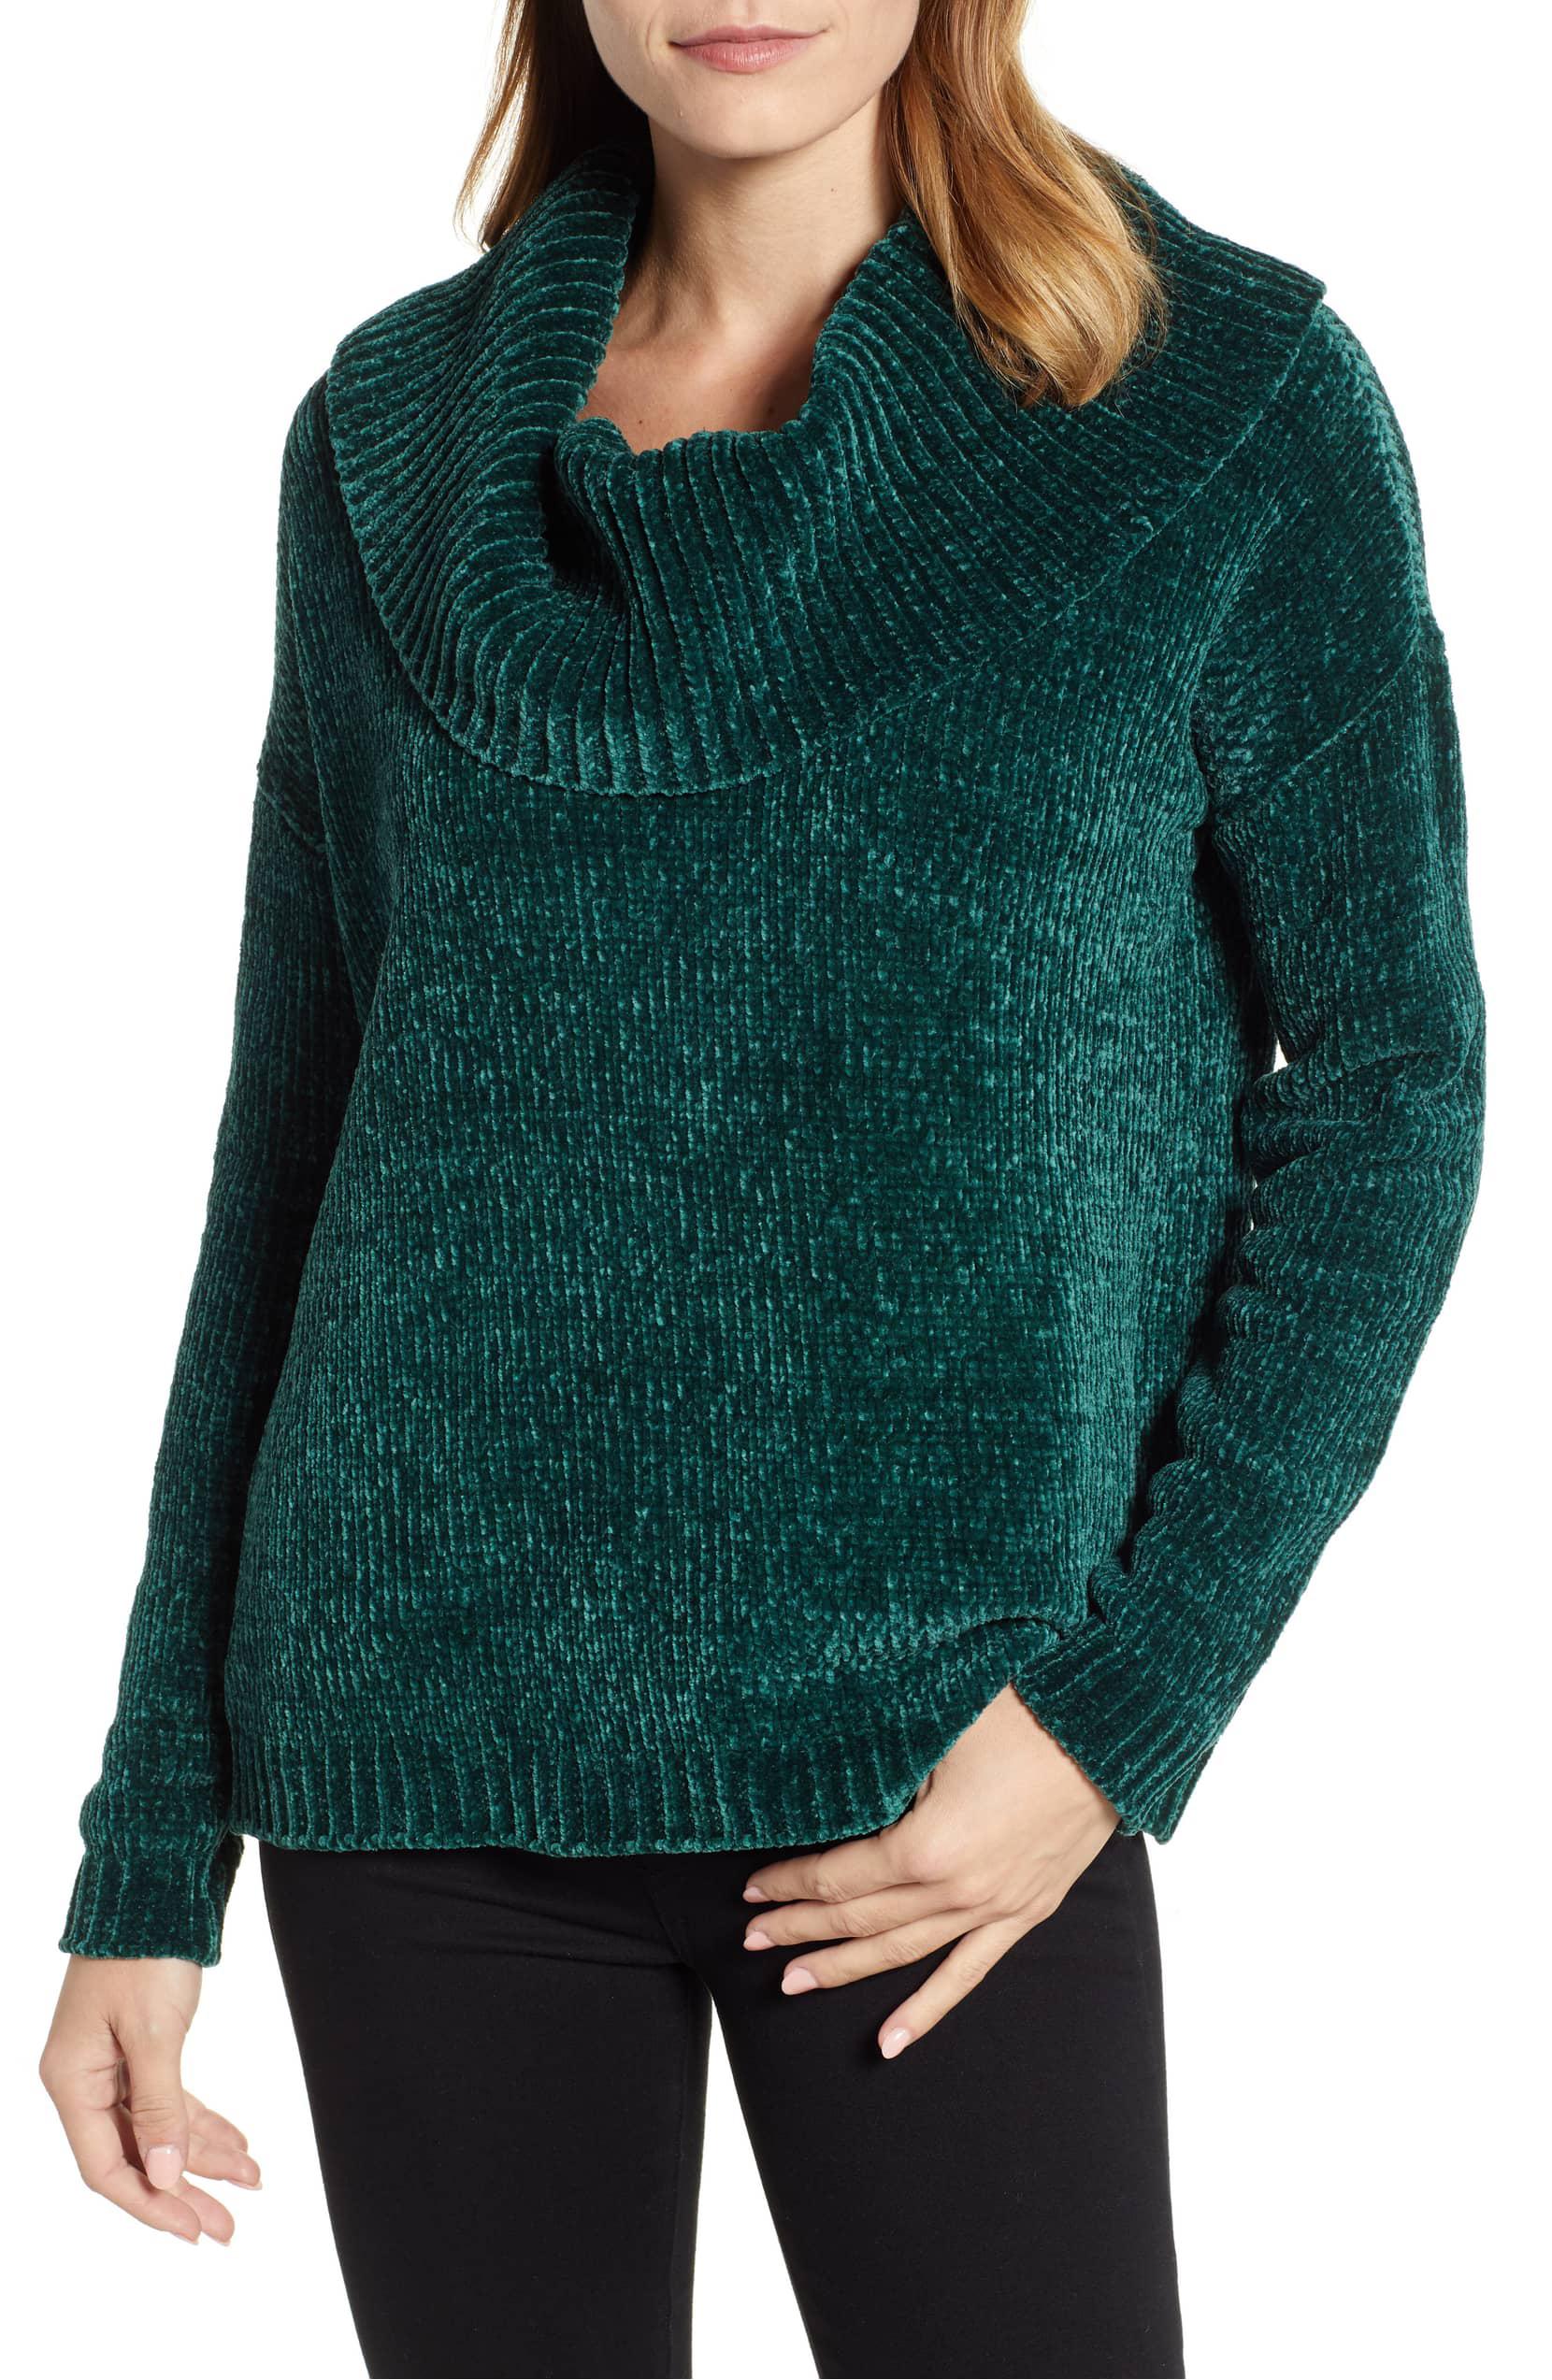 nordstrom michael kors sweater